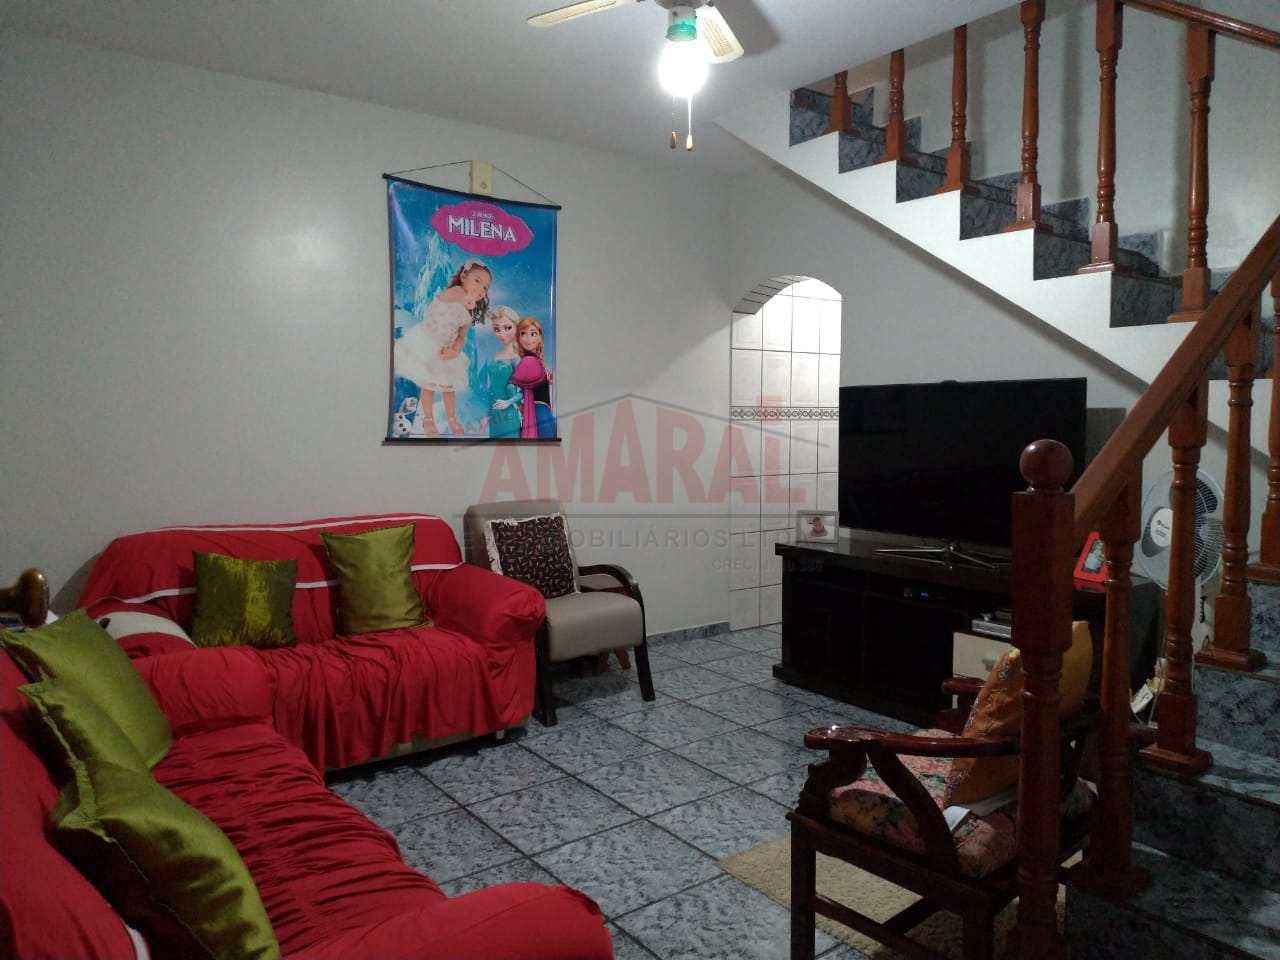 Sobrado com 3 dorms, Jardim Vera Cruz(Zona Leste), São Paulo - R$ 298 mil, Cod: 11254